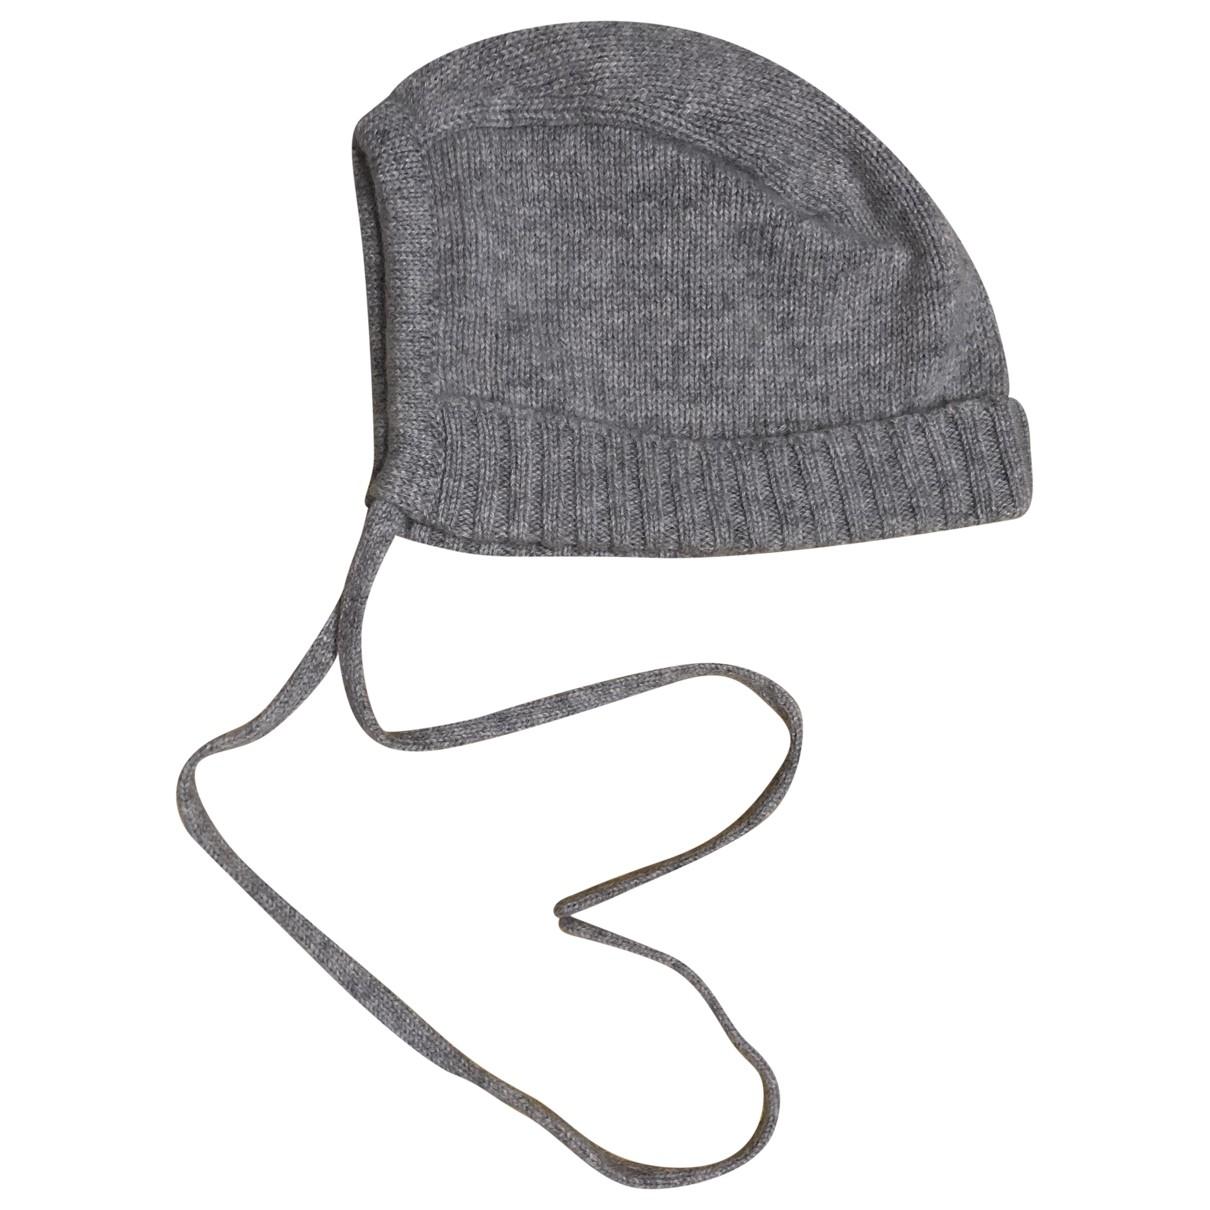 Bonpoint \N Hut, Muetzen, Handschuhe in  Grau Kaschmir